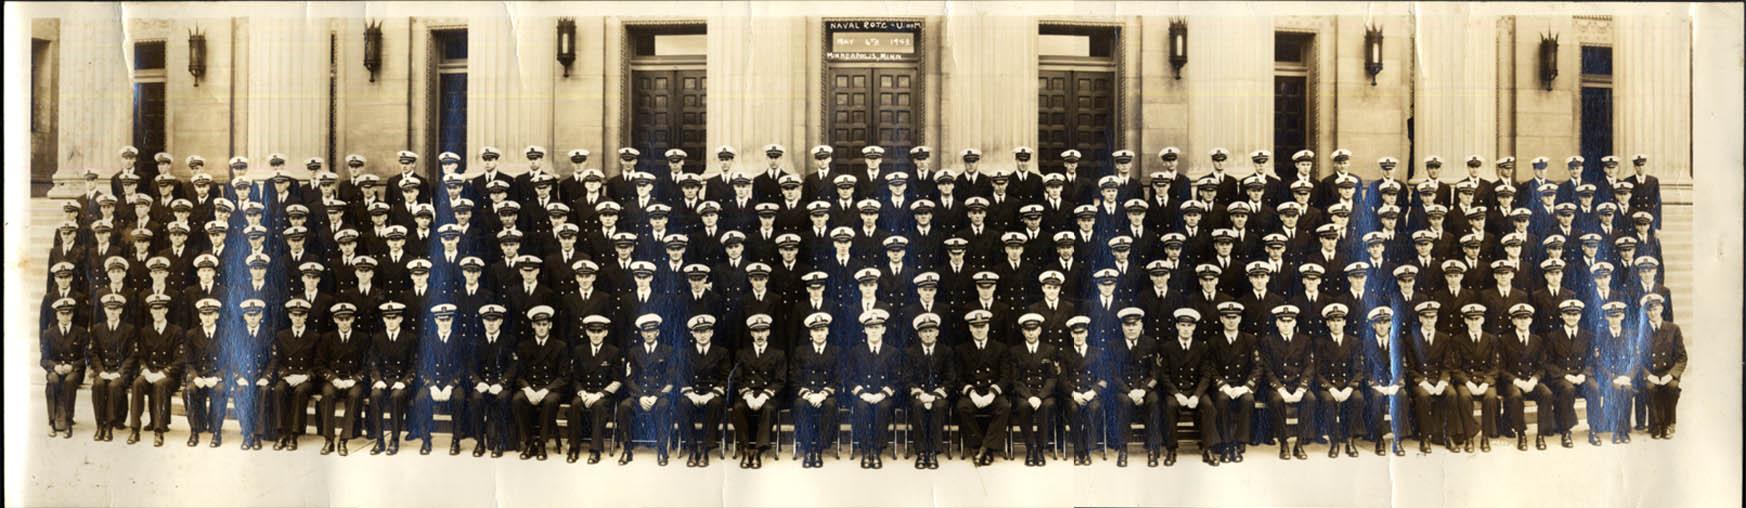 US Naval Navy ROTC Class University of Minnesota 5/6 1943 Minneapolis photo